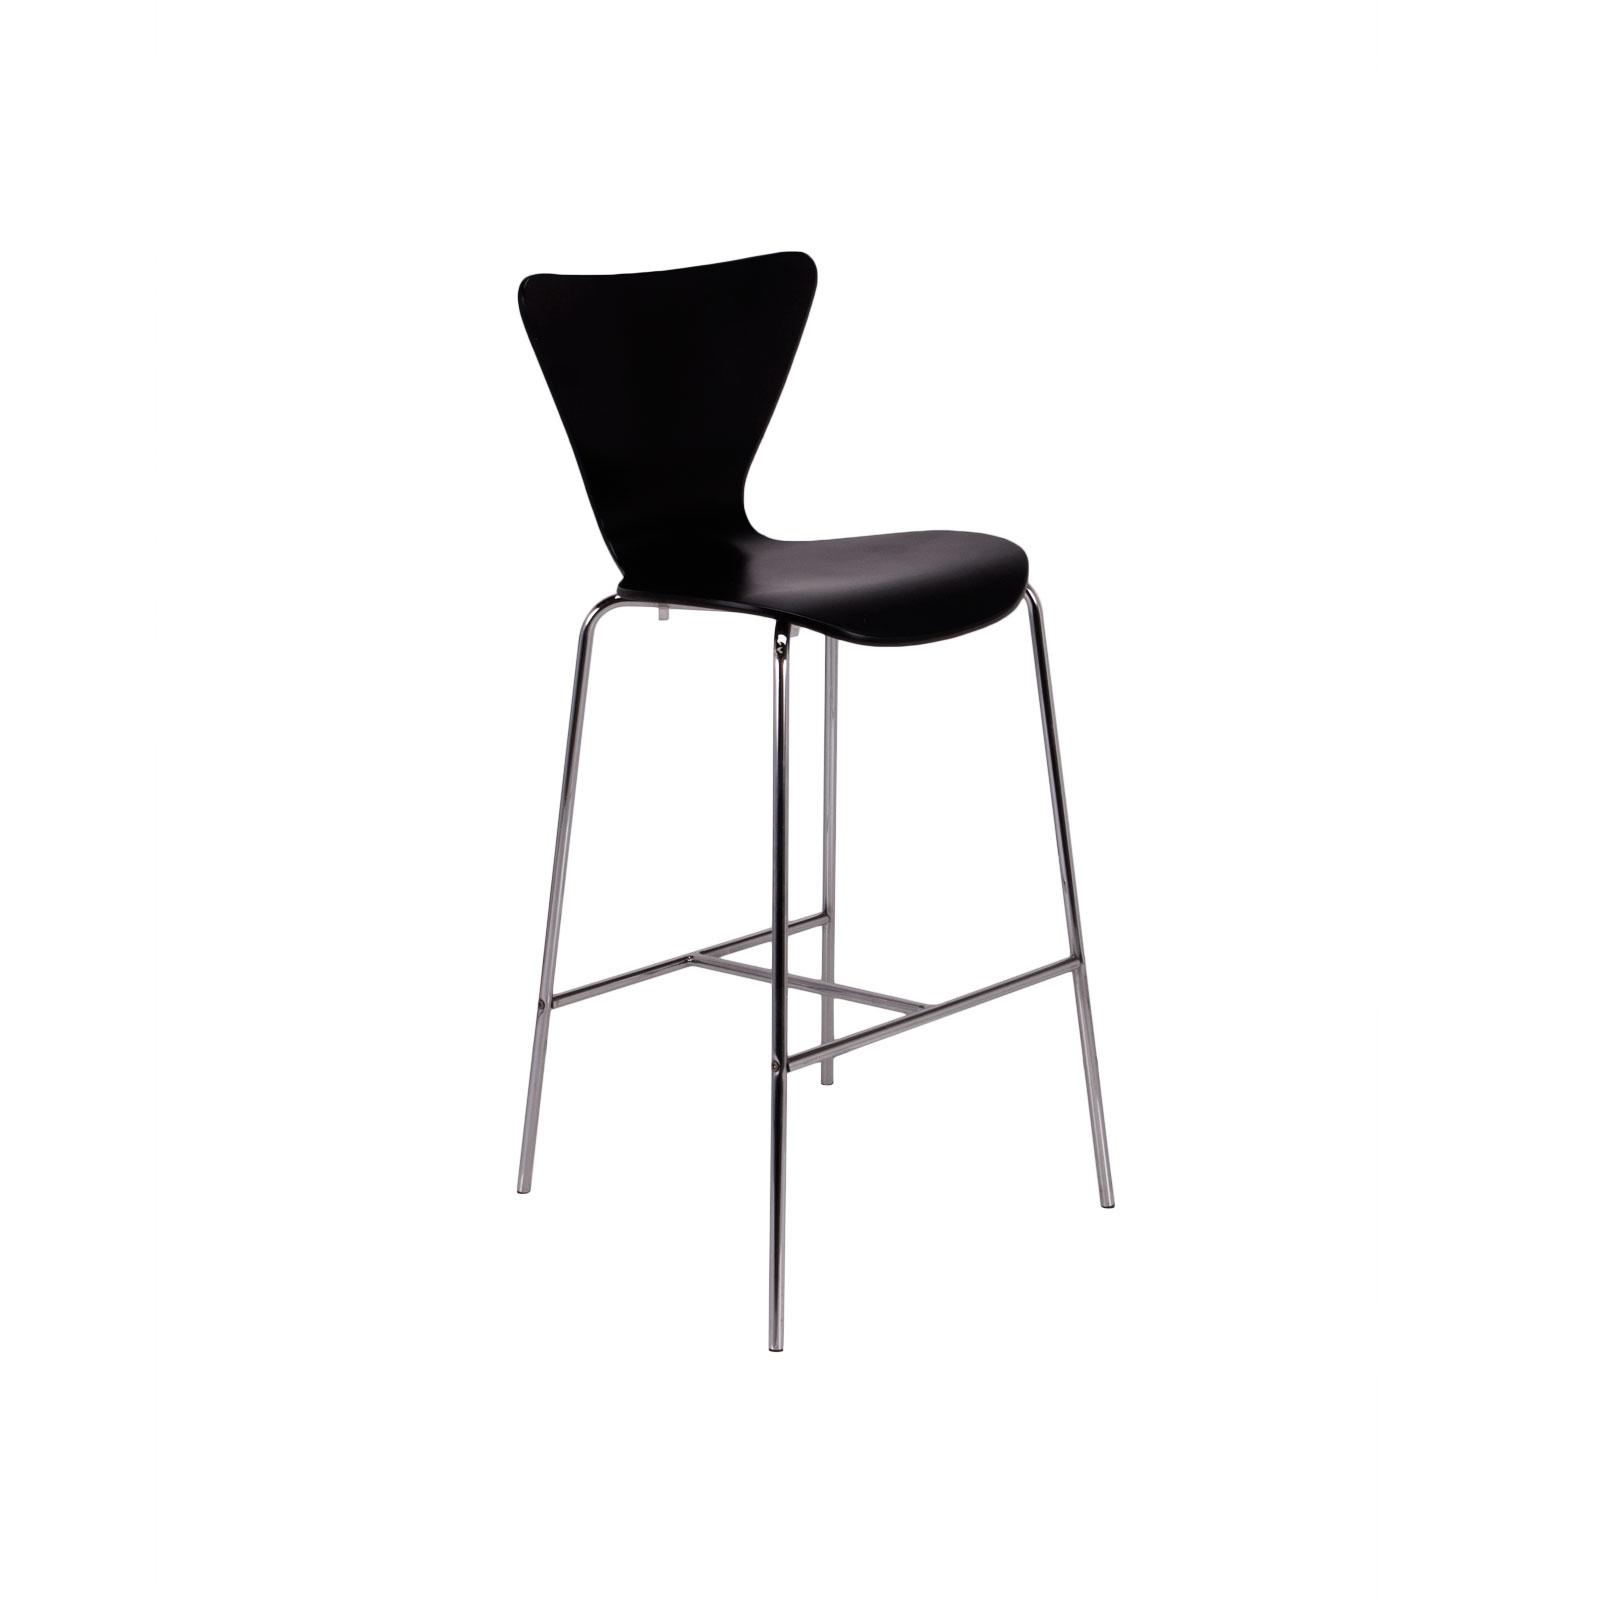 Series 7 Barstool Rentals Event Furniture Rental